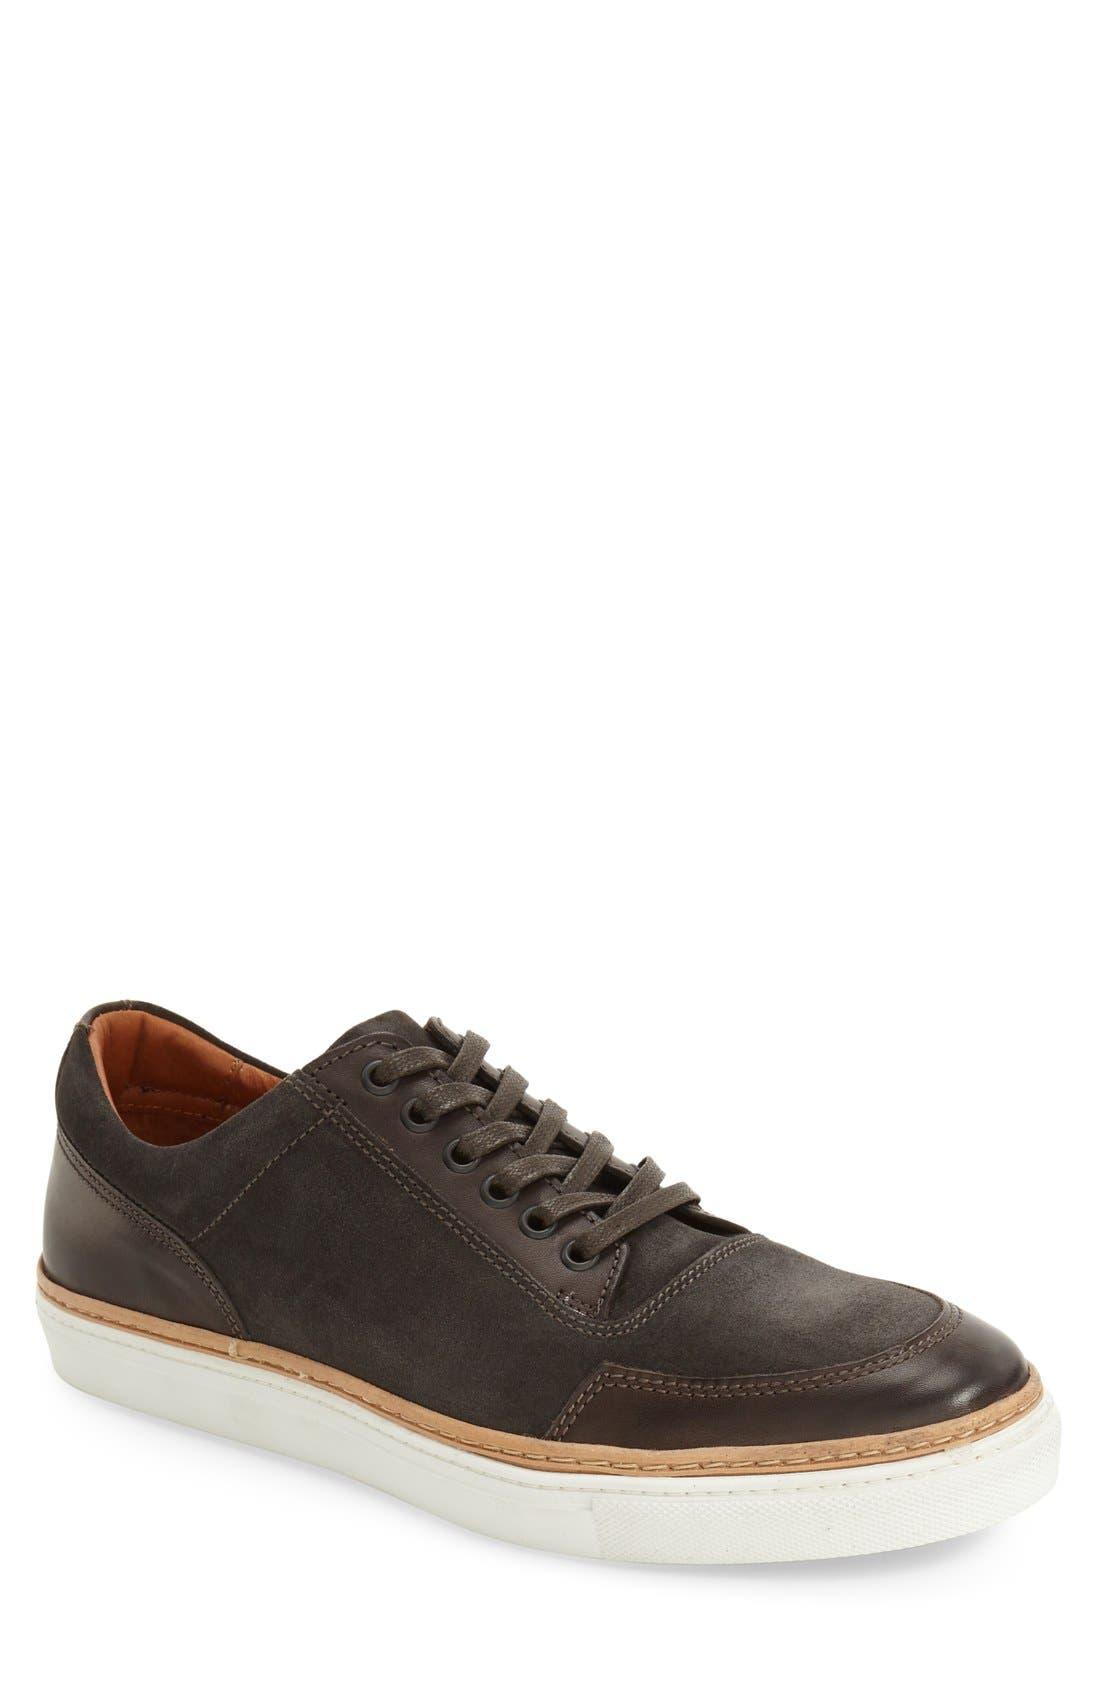 Prem-Ium Sneaker,                             Main thumbnail 1, color,                             020